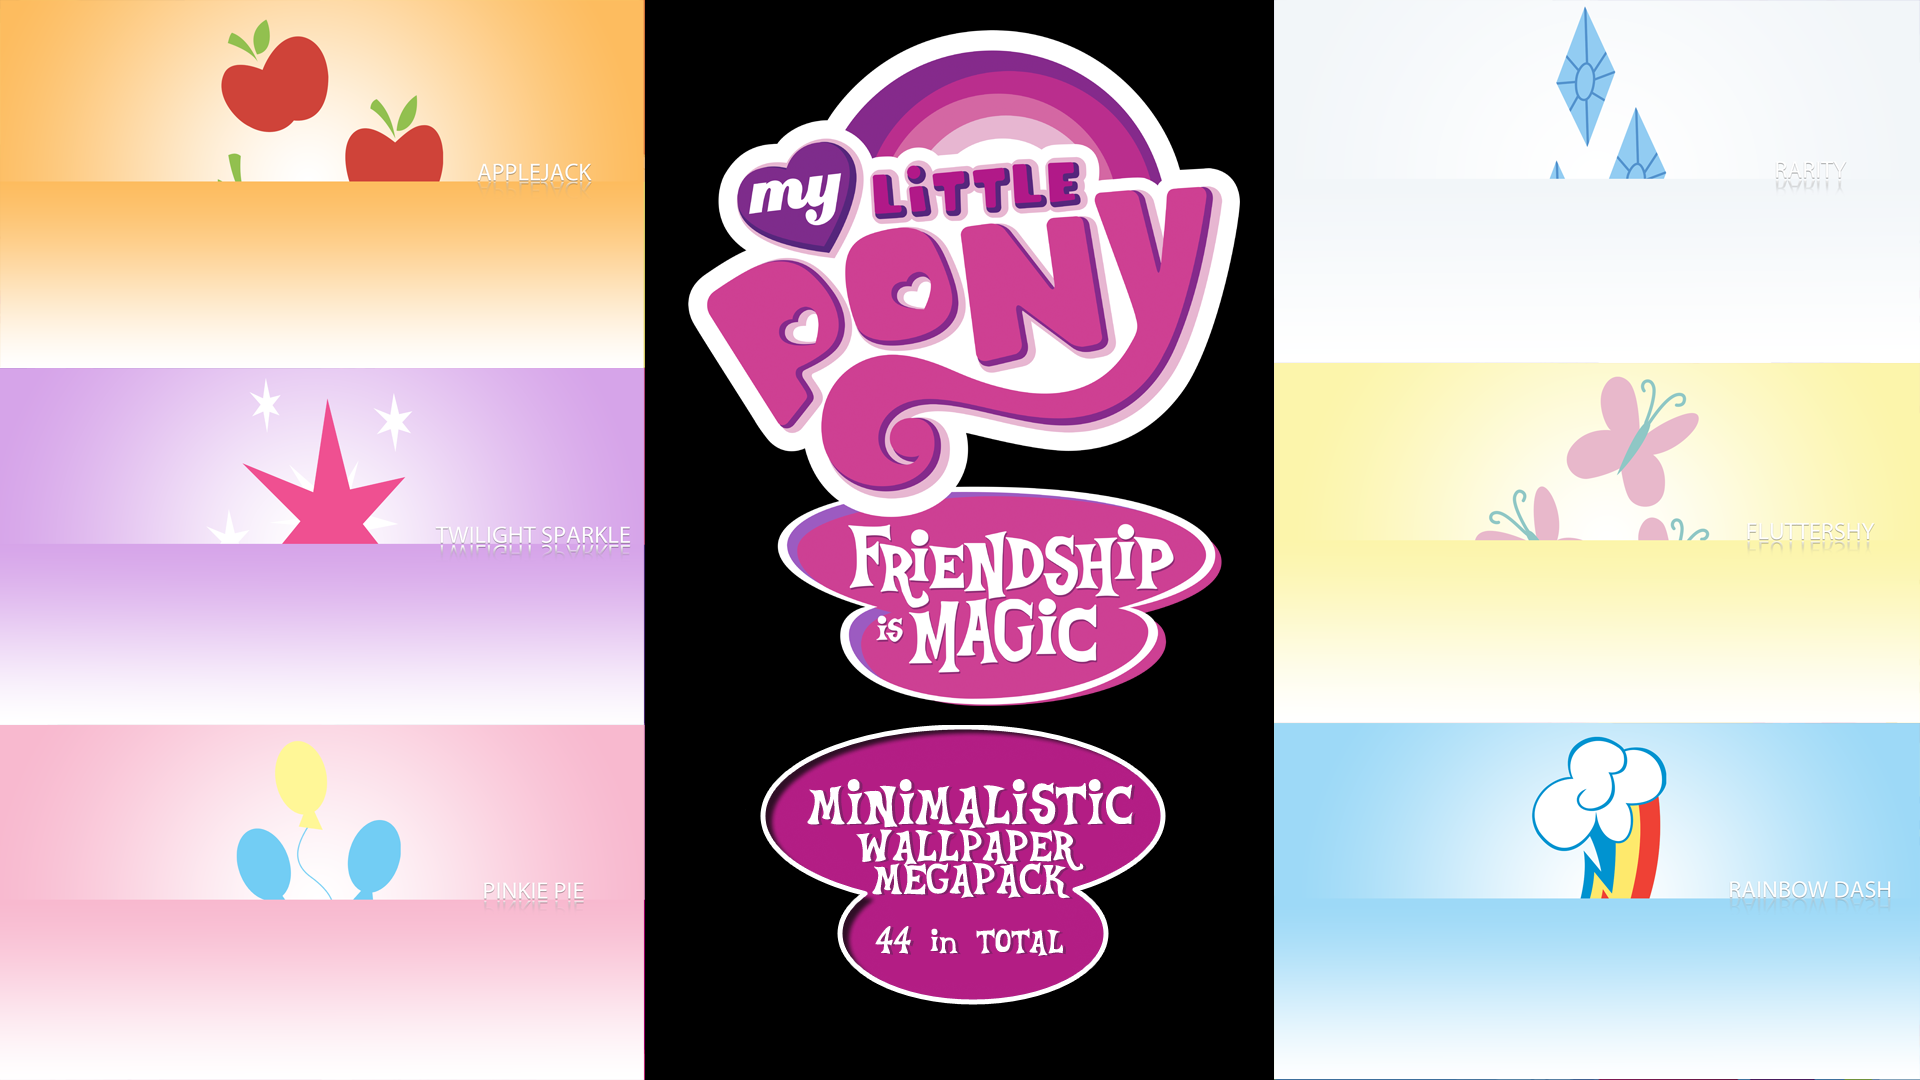 My Little Pony FIM Minimalistic Wallpaper Megapack